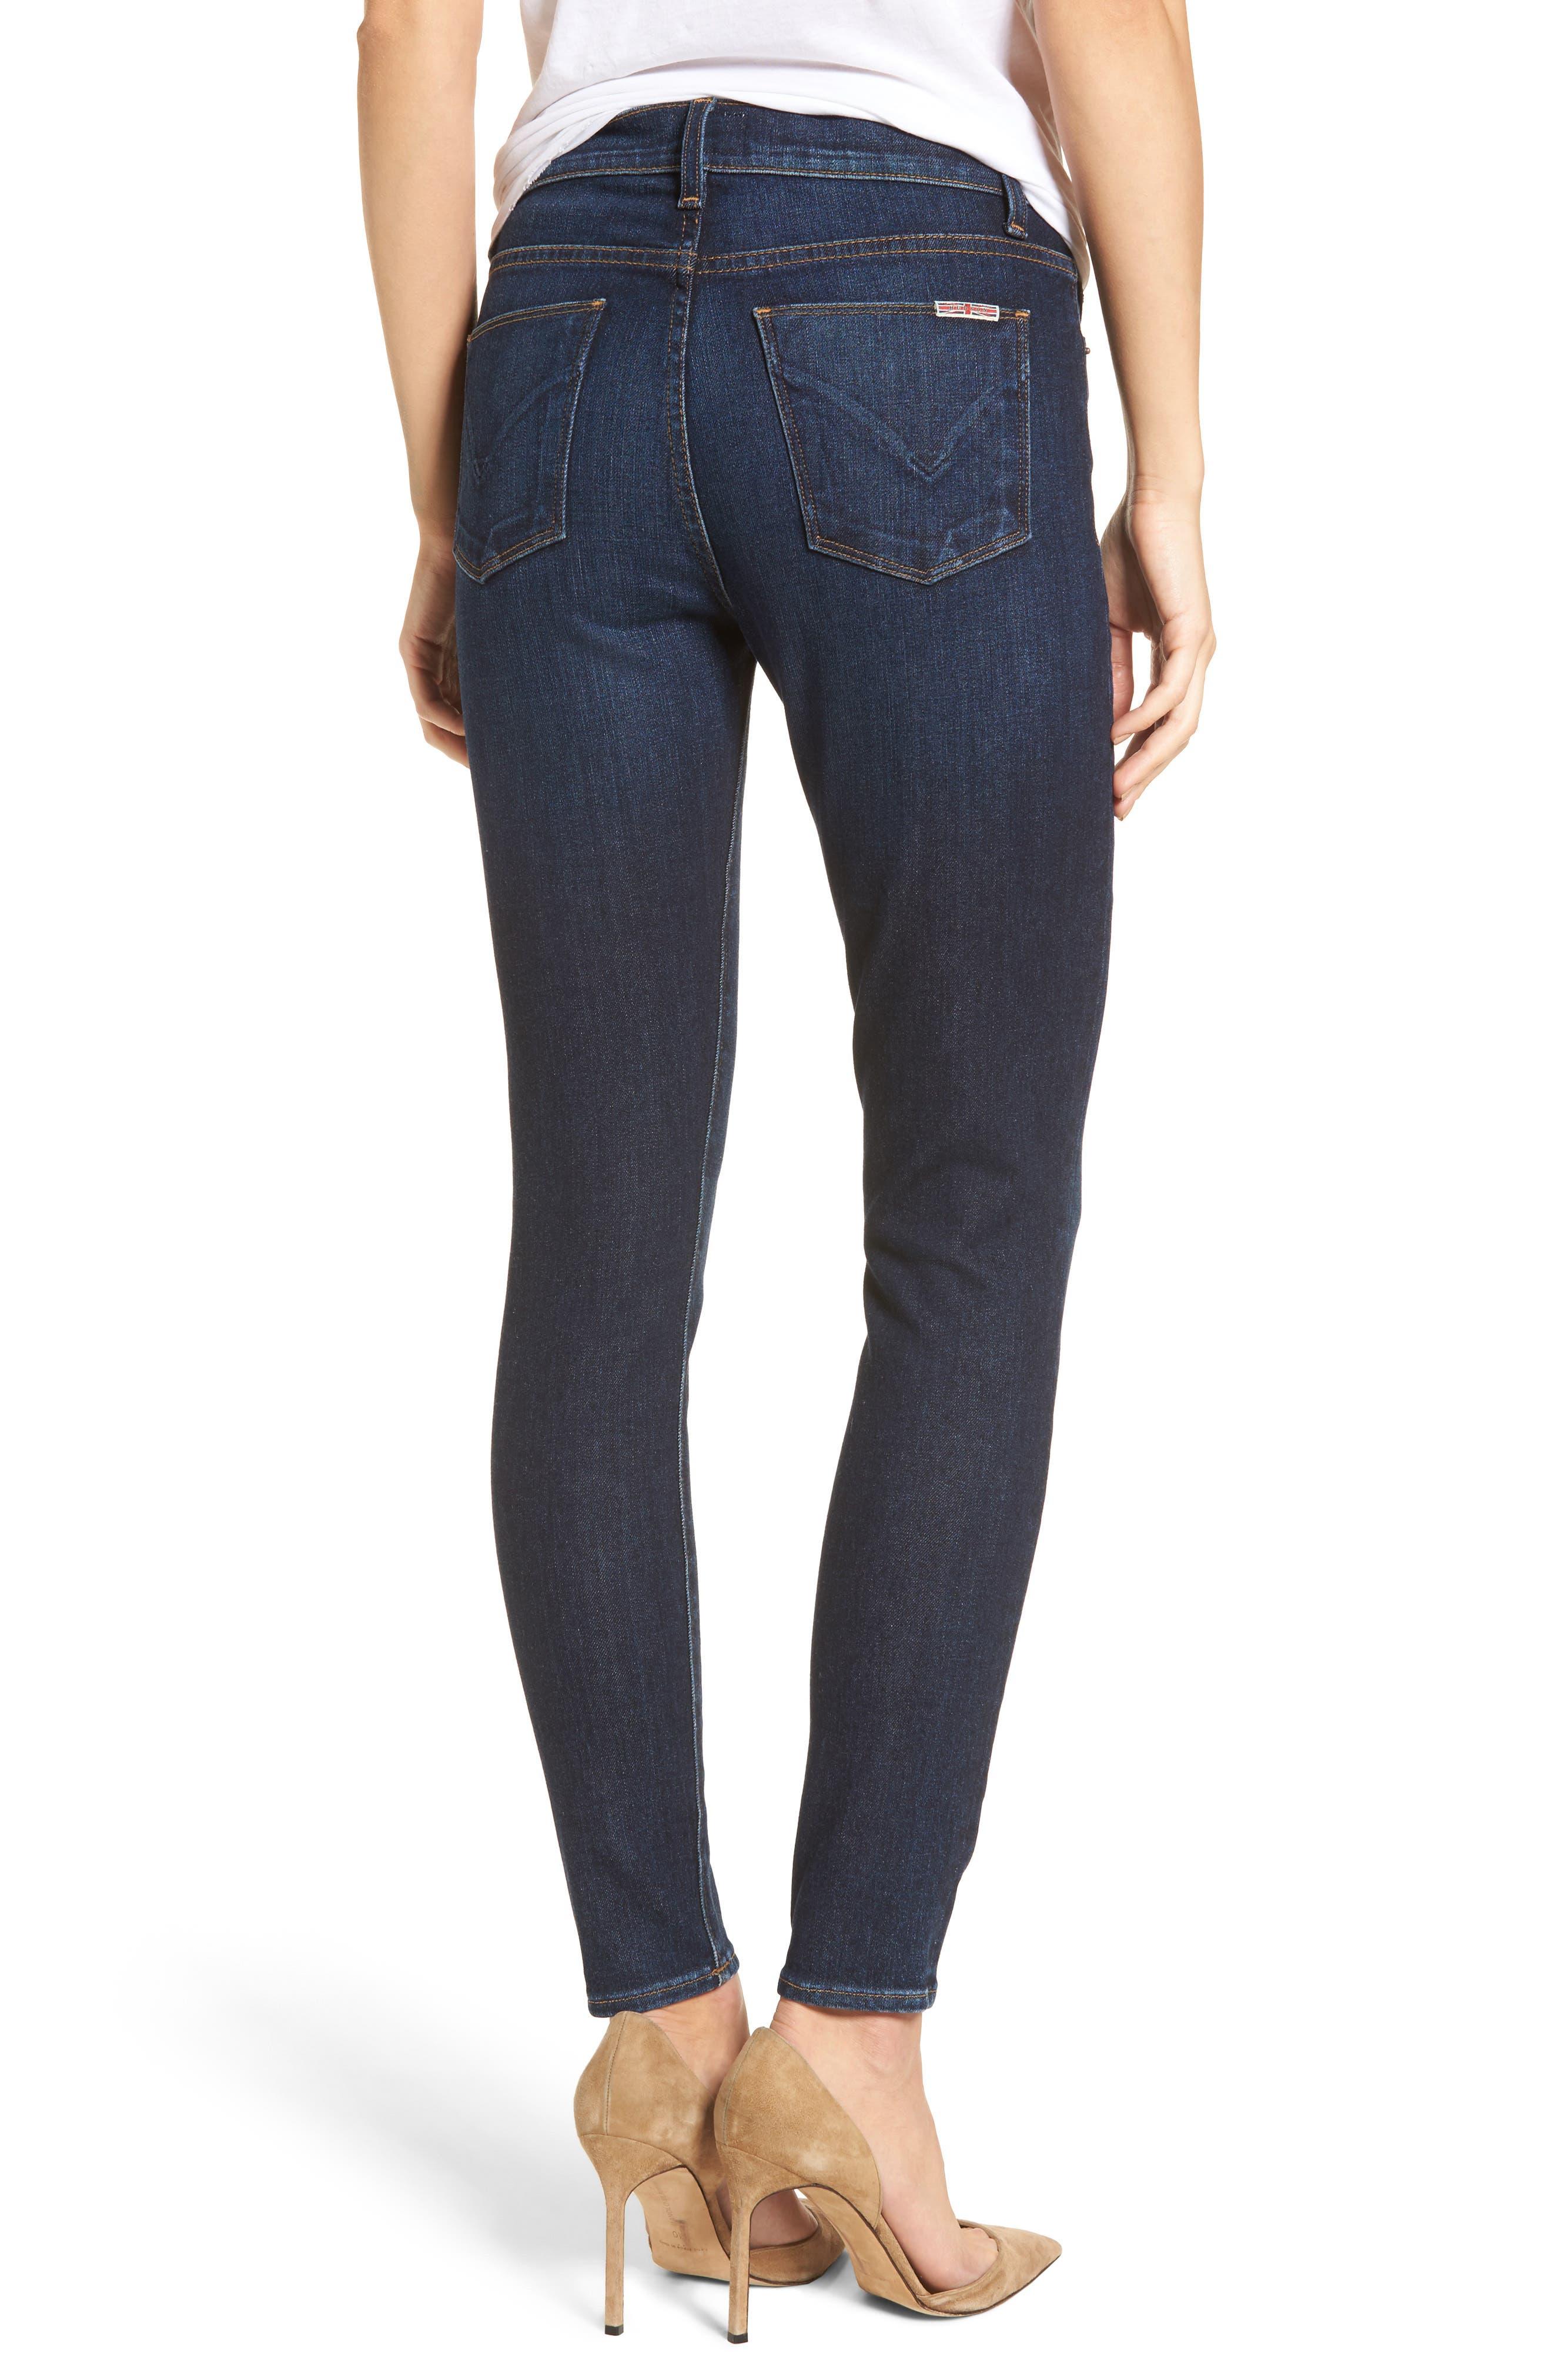 Barbara High Waist Ankle Super Skinny Jeans,                             Alternate thumbnail 2, color,                             Daze